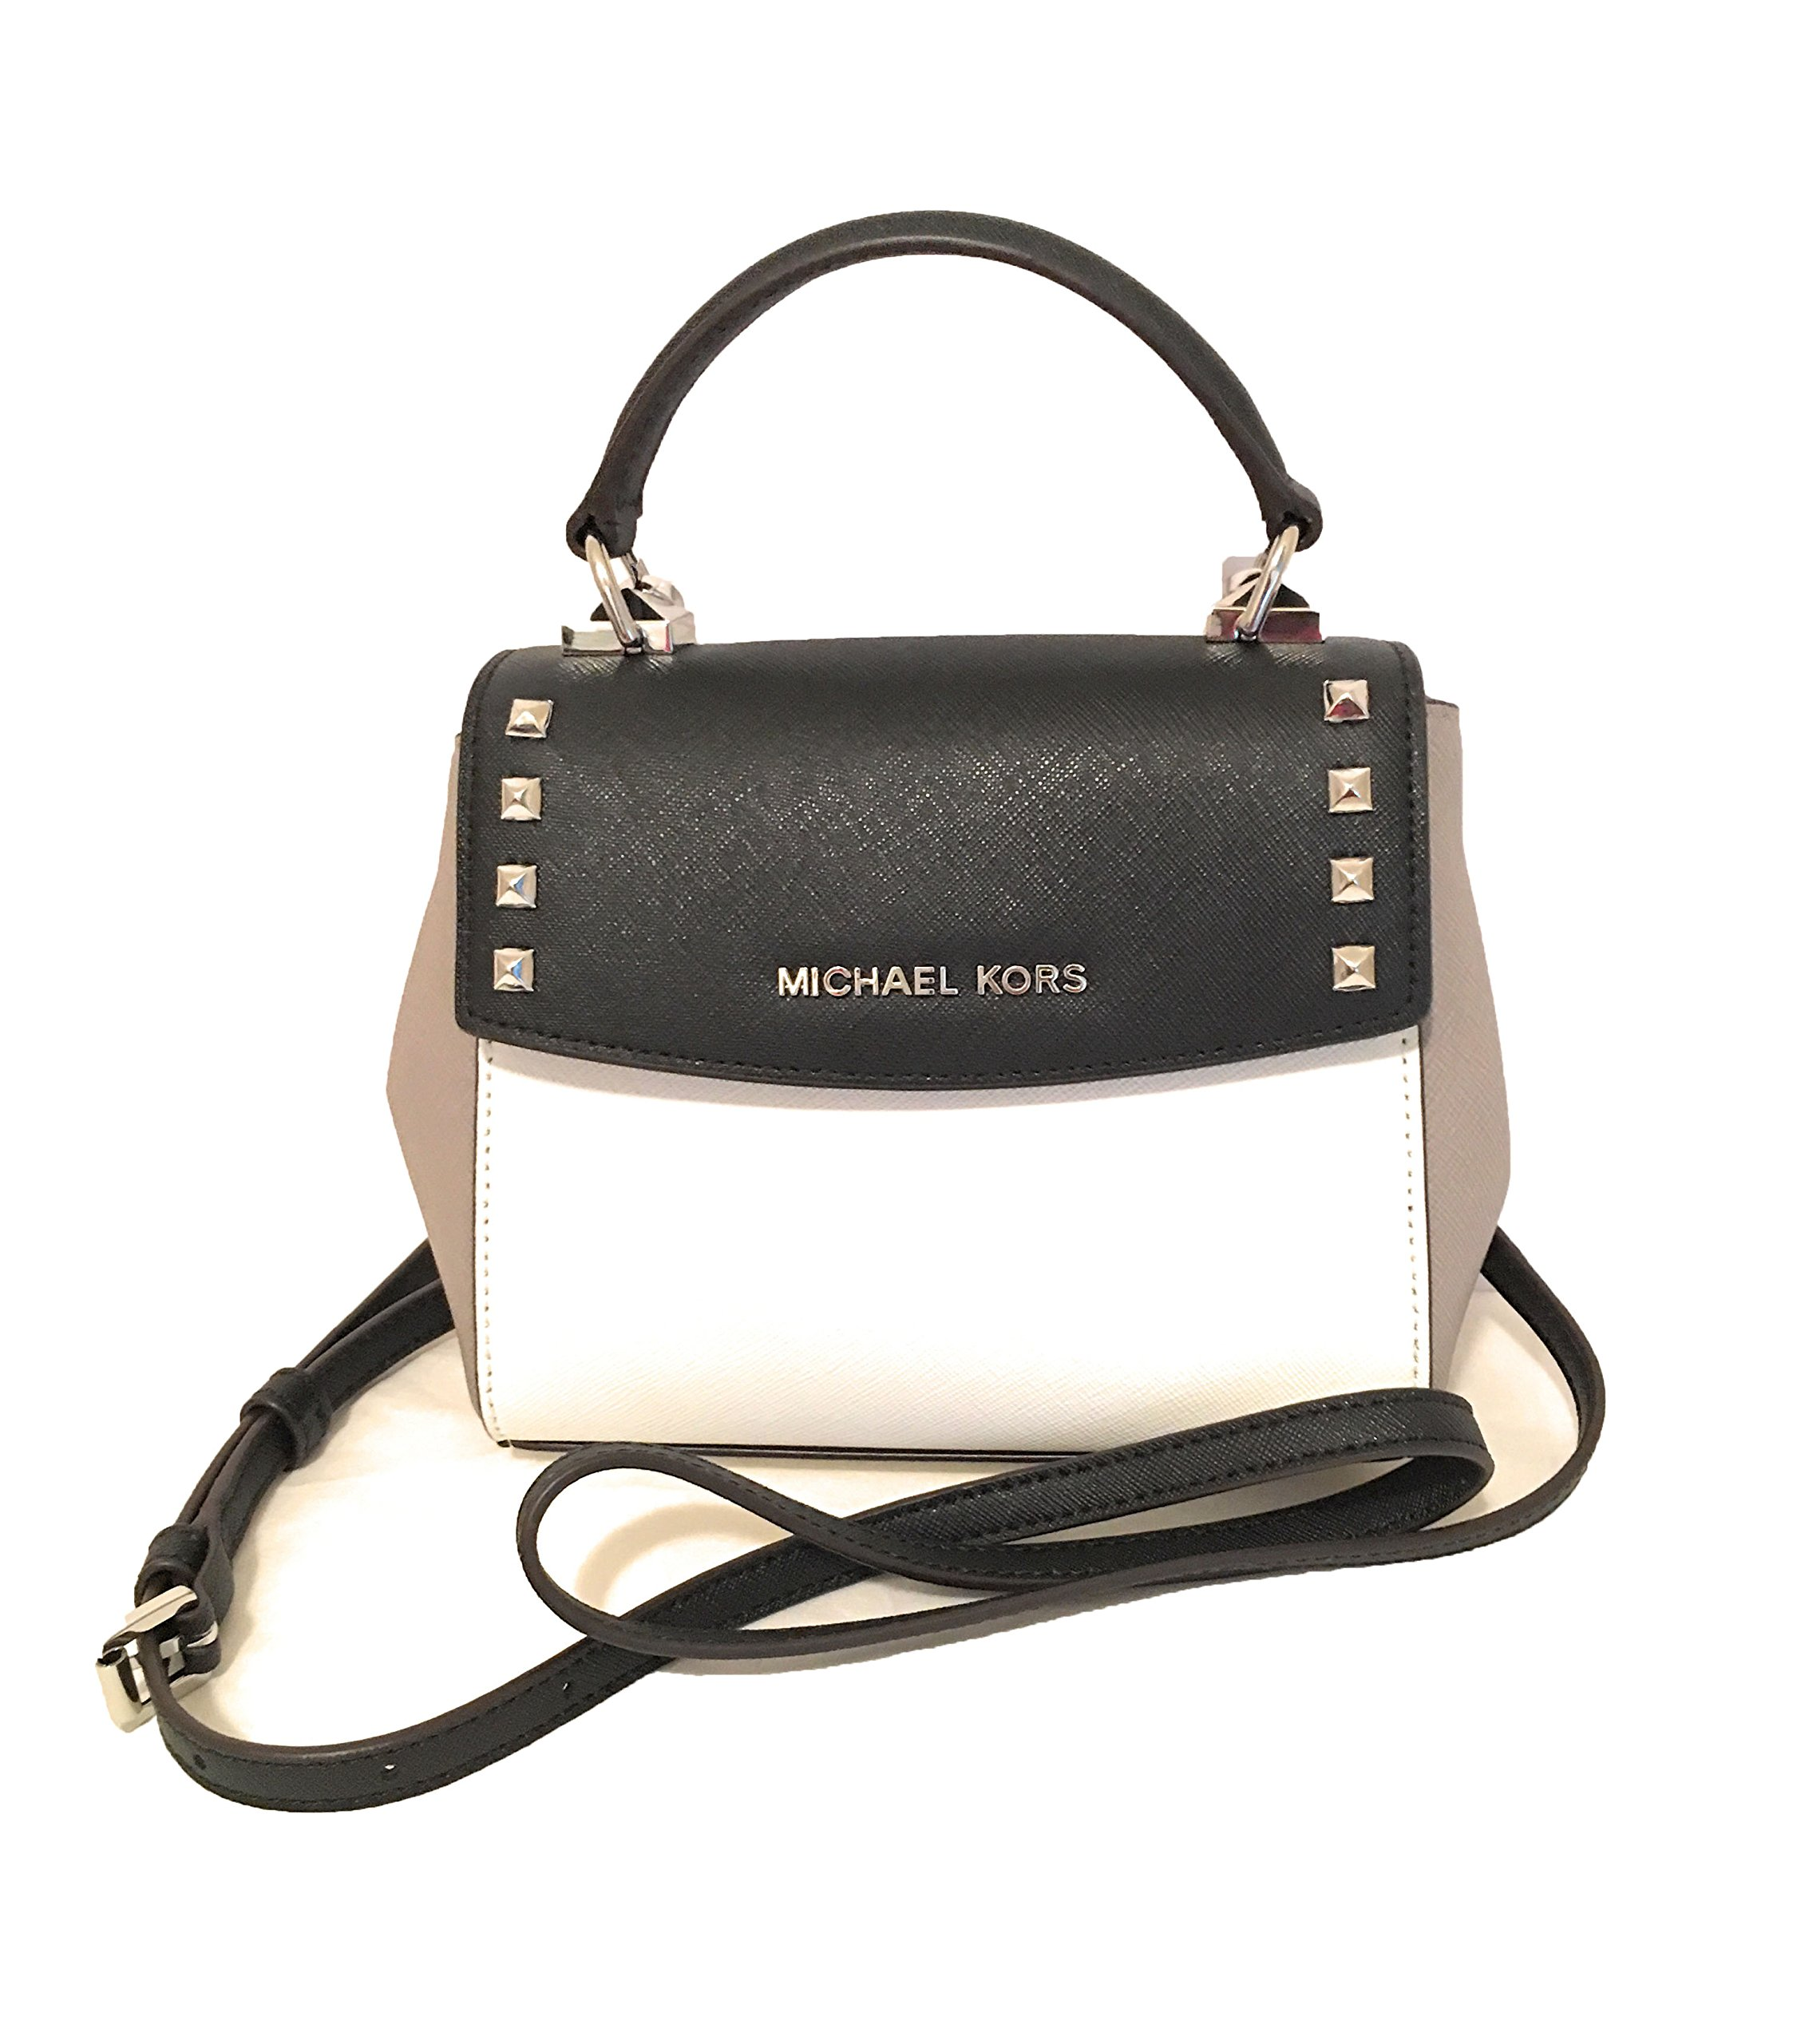 d3405e7a742dd5 Galleon - Michael Kors Karla Mini Convertible Saffiano Leather Crossbody  Handbag (Black/White)